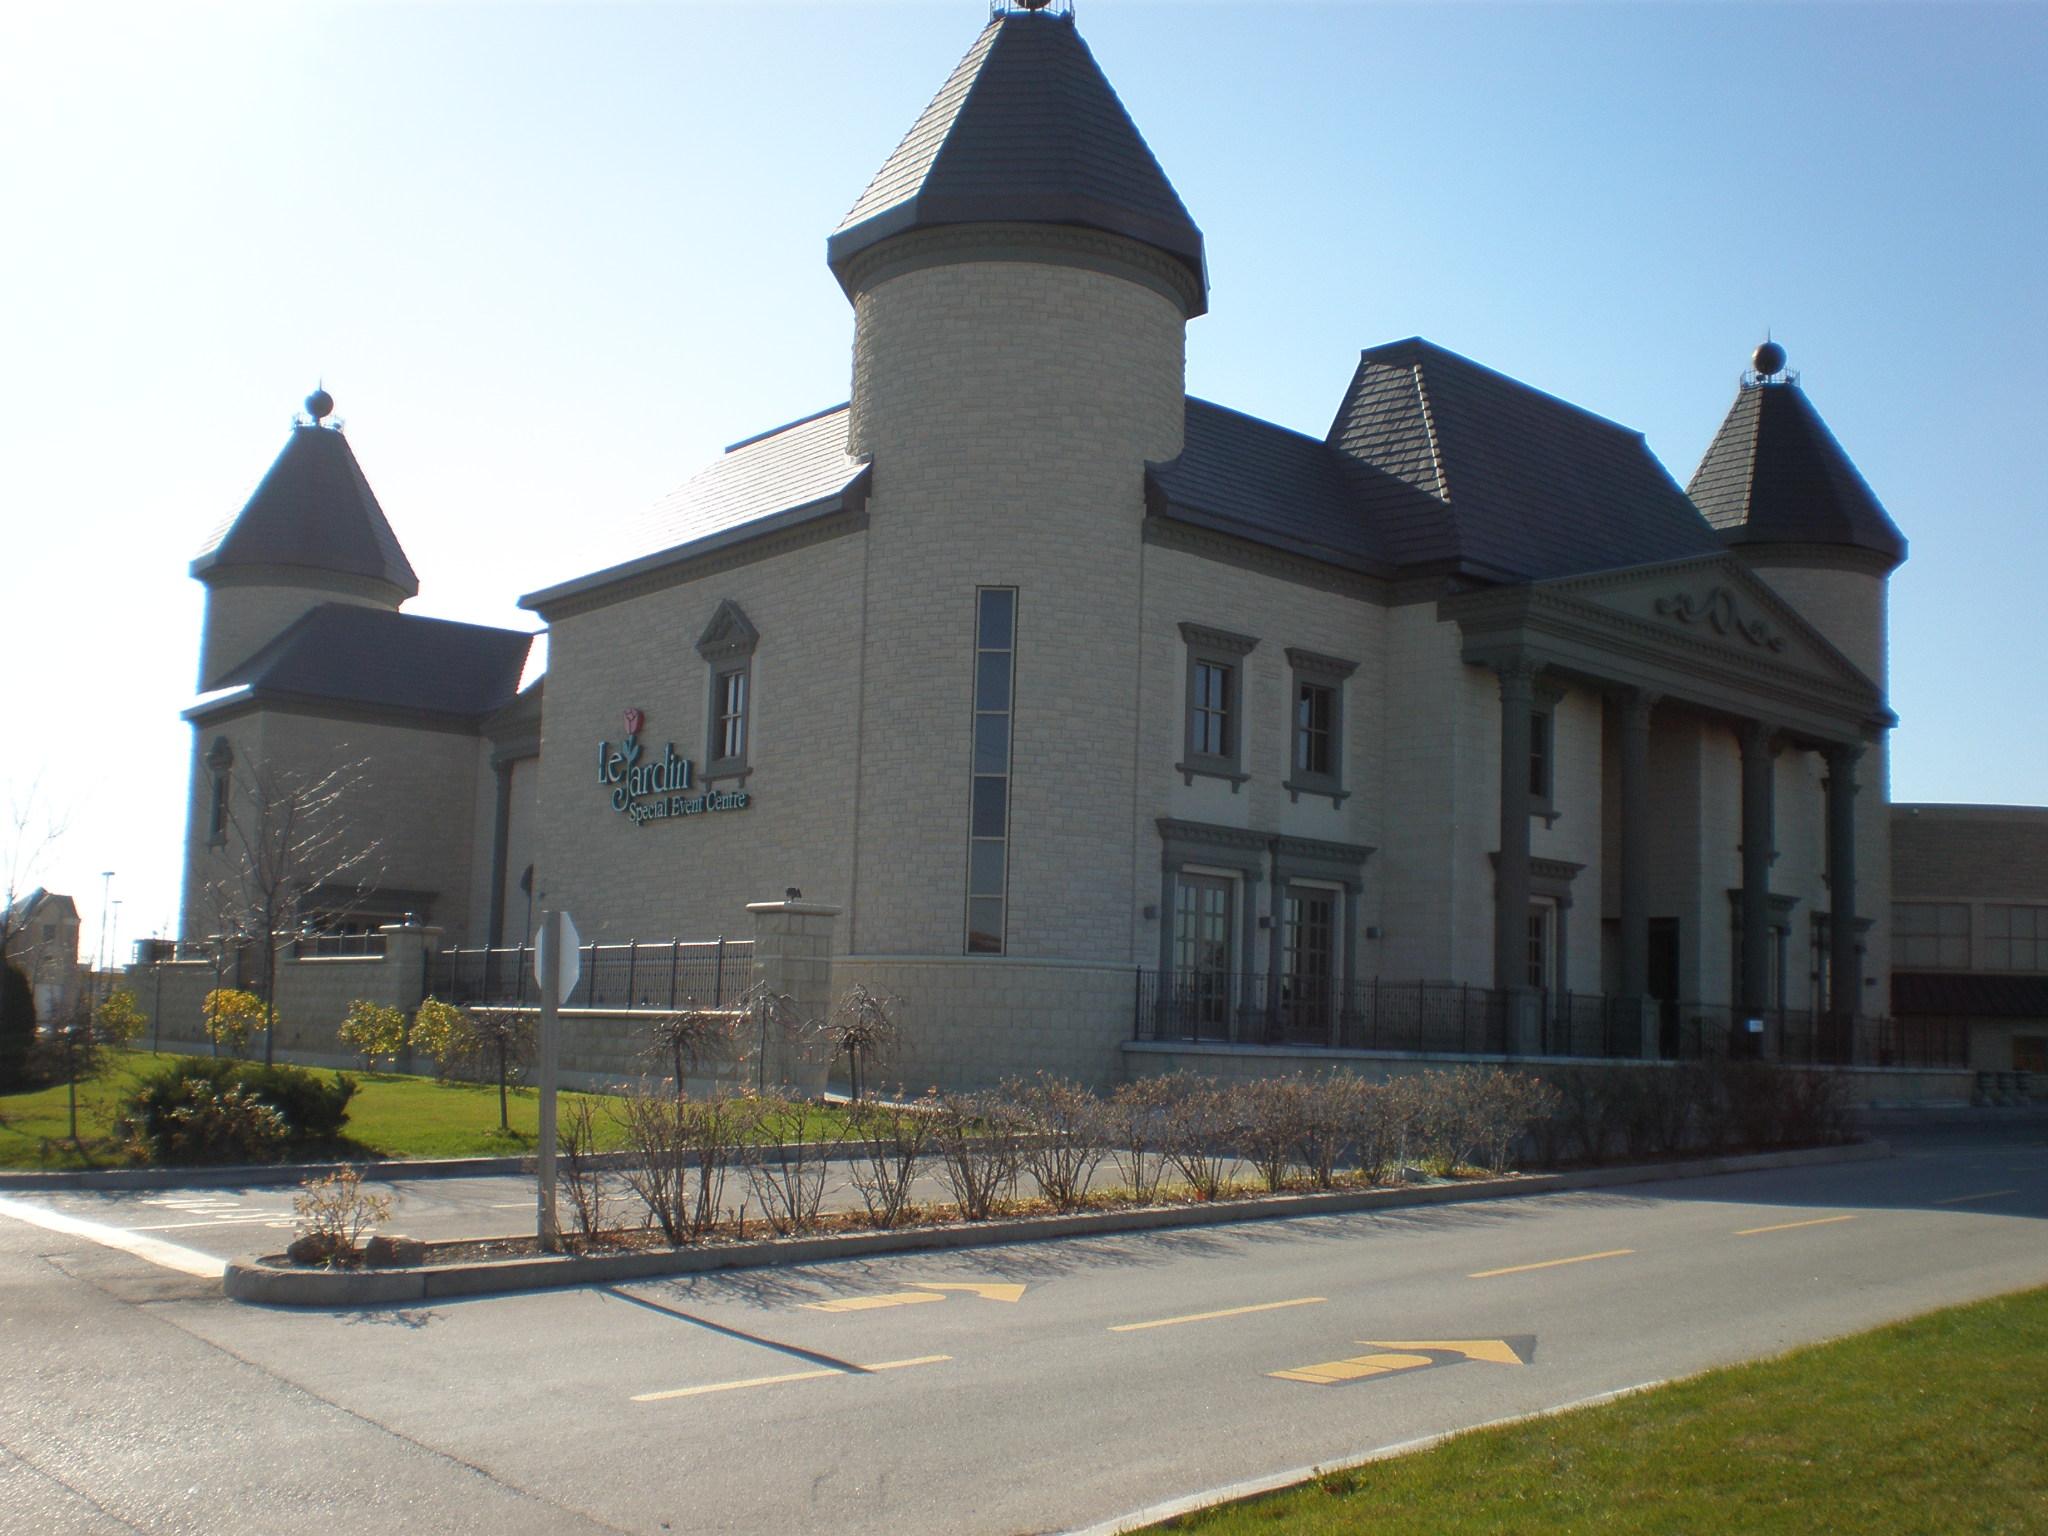 LeJardin Banquet Hall